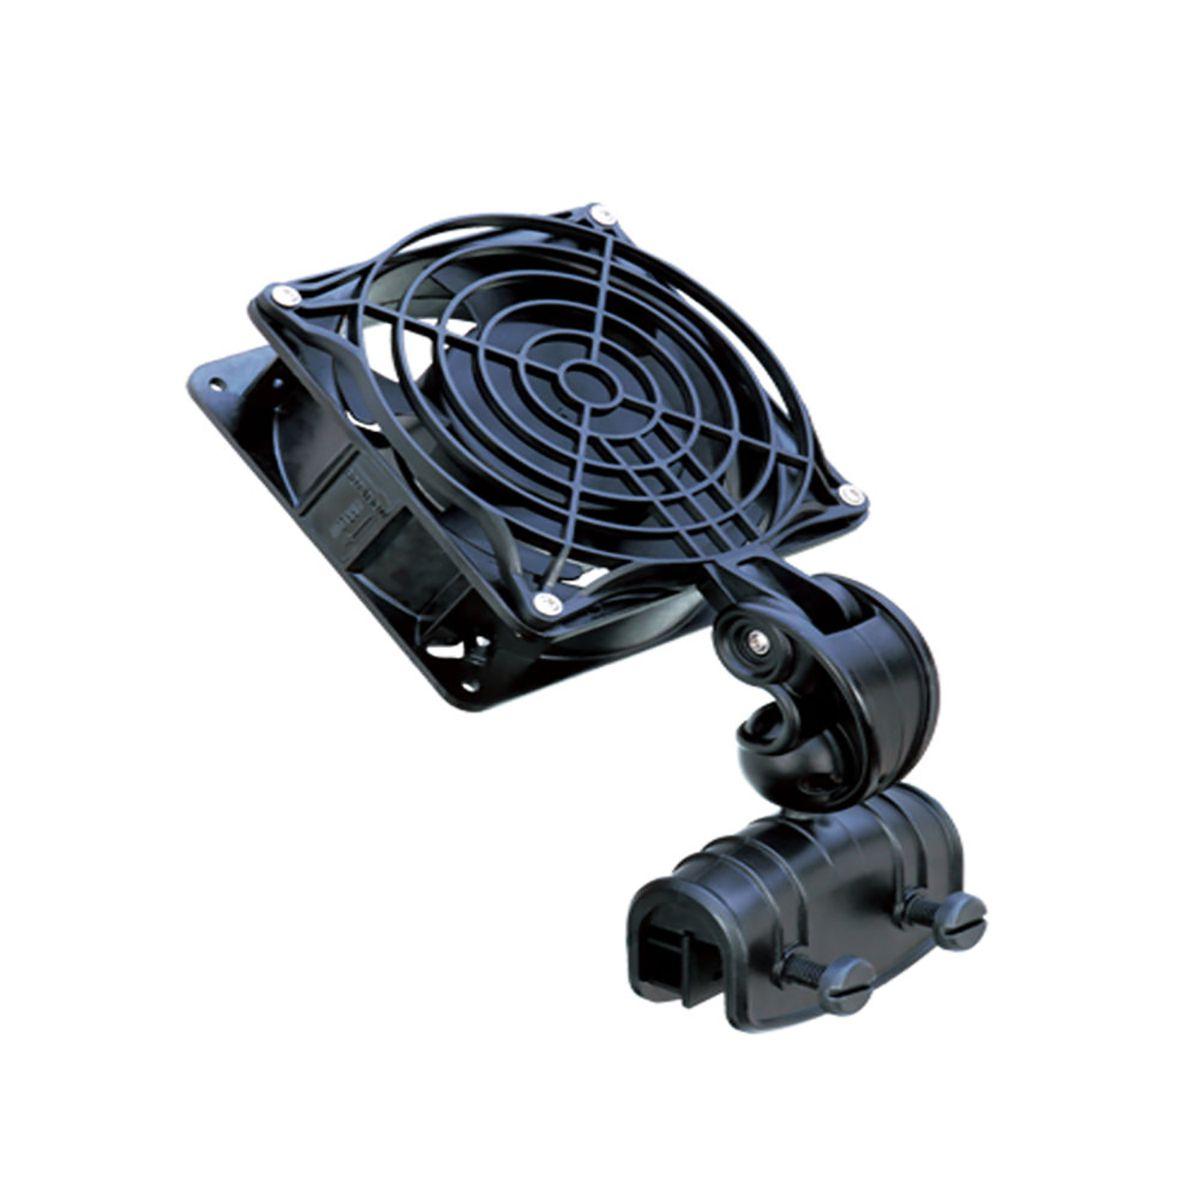 Boyu Mini Cooler FS-120 Com Haste Flexível